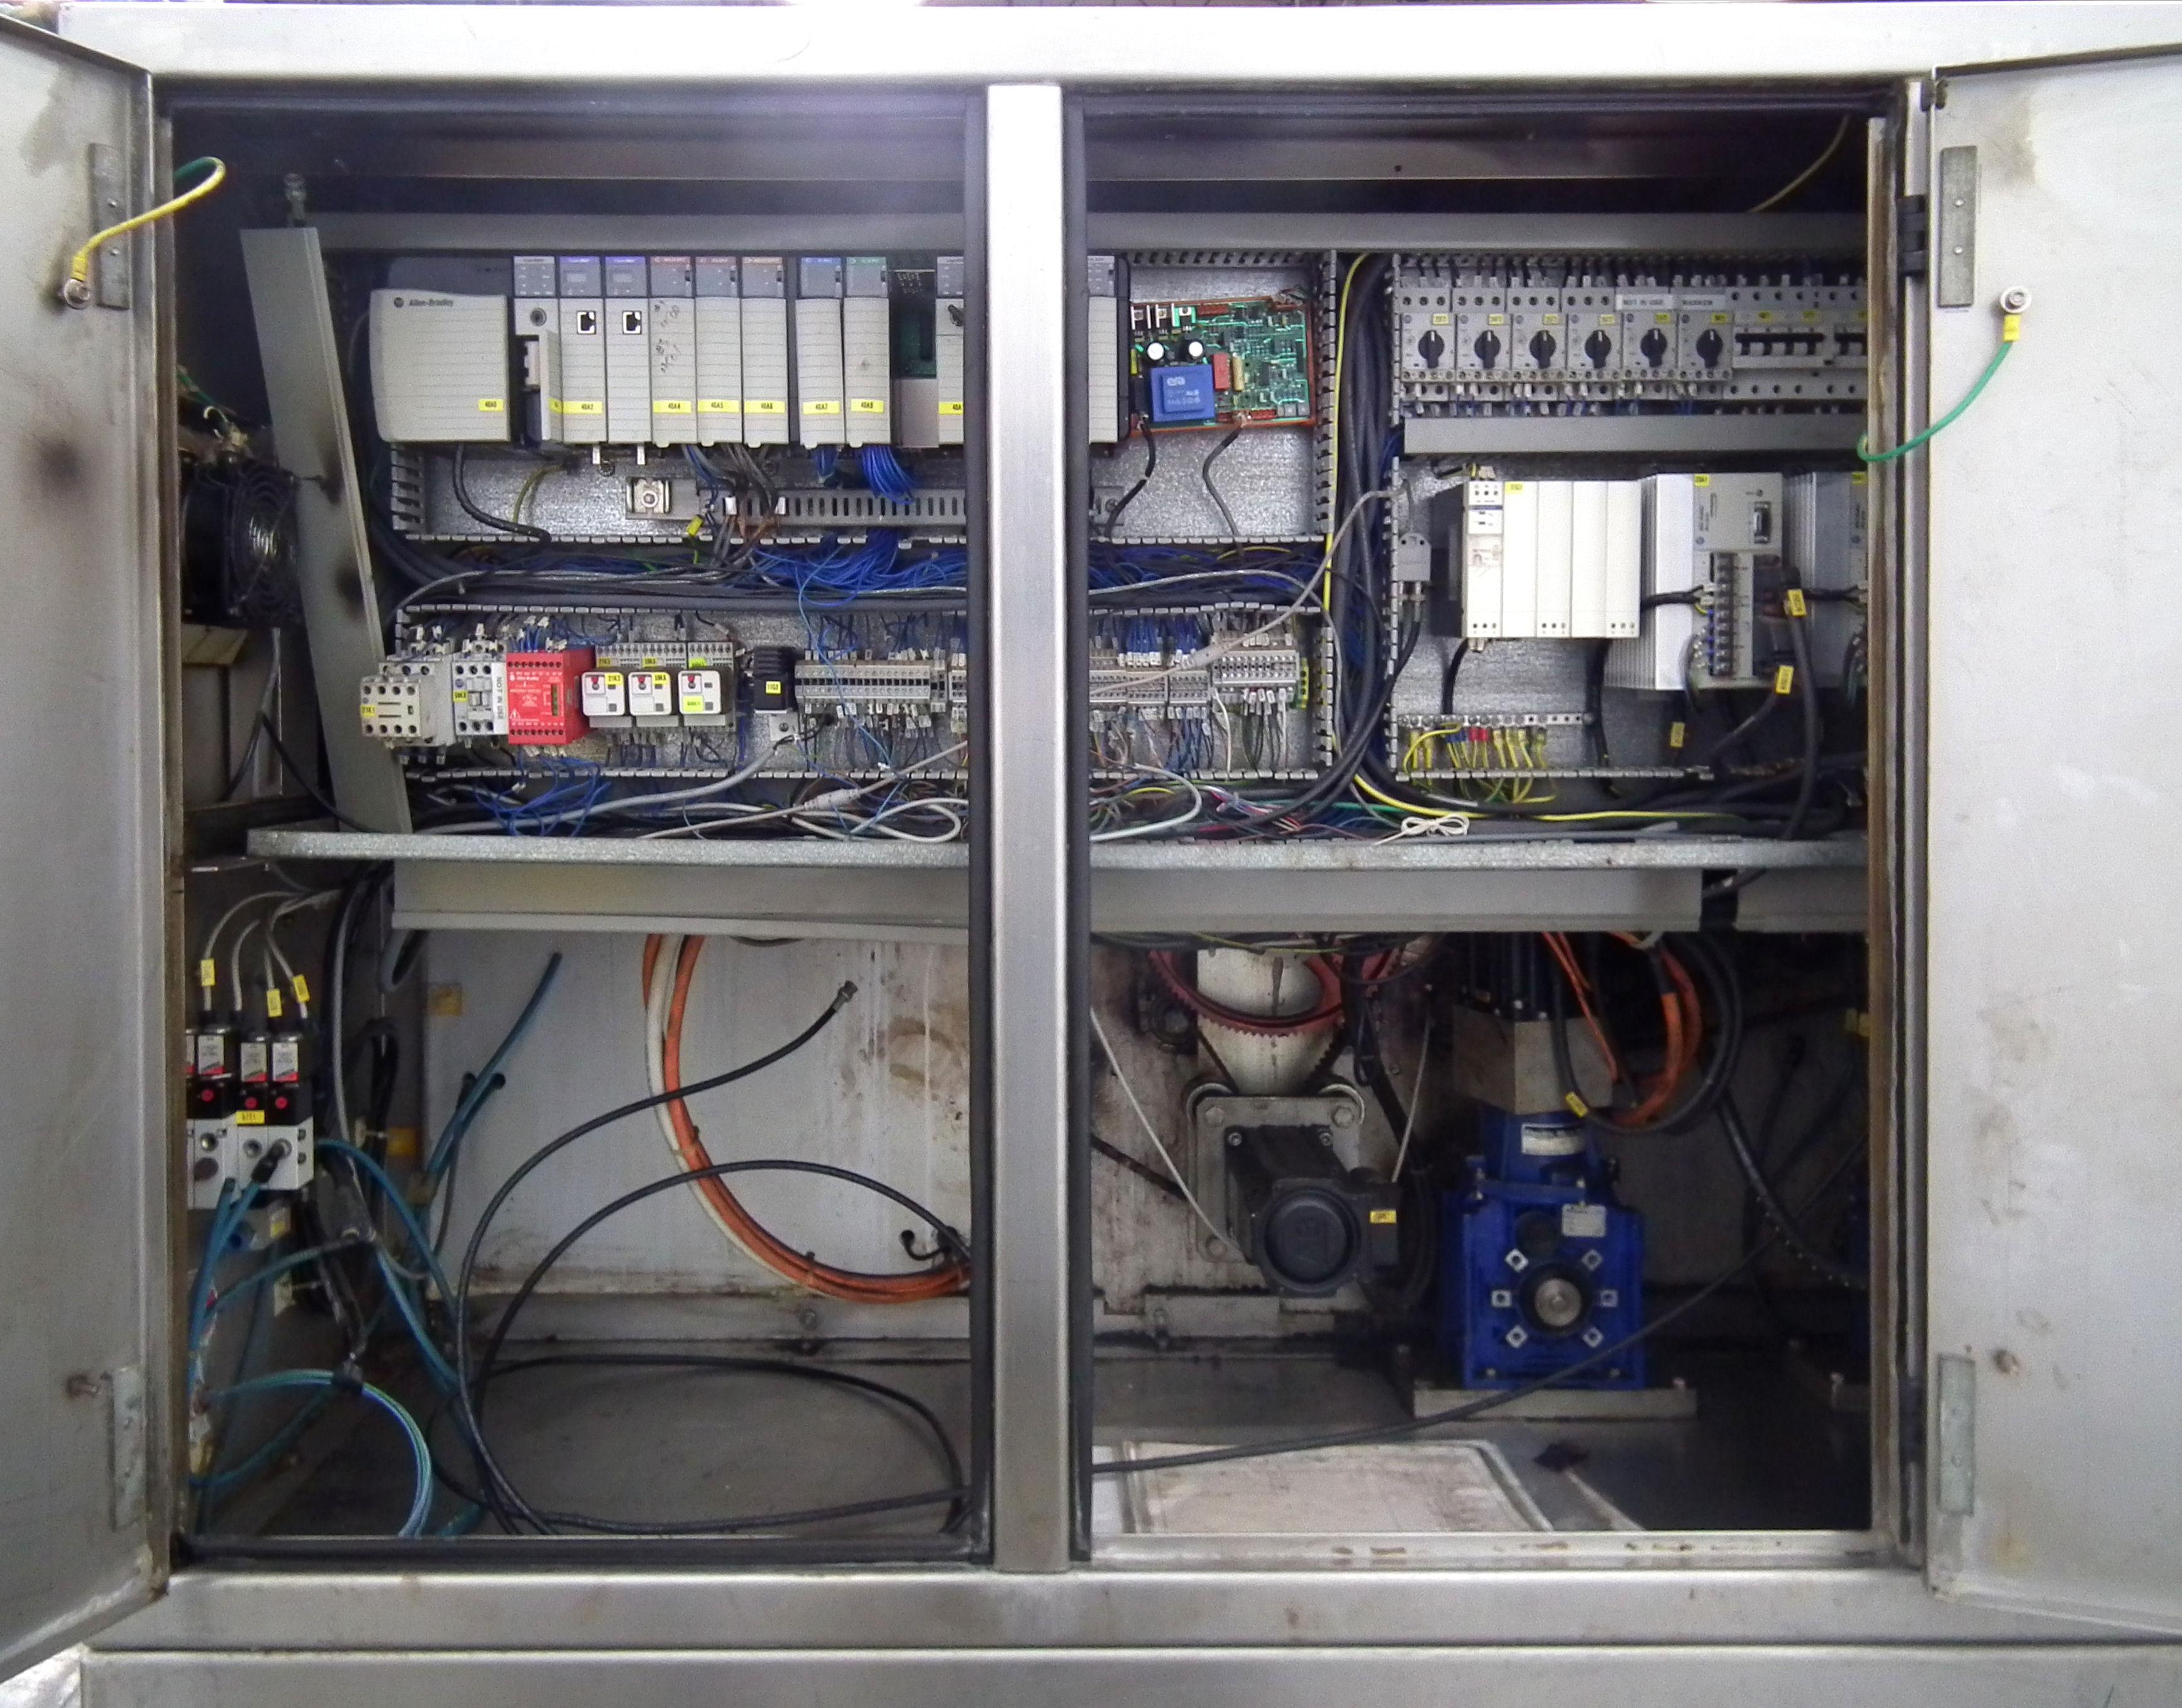 Ilapak Delta 3000 DC Wrapper B4827 - Image 11 of 13